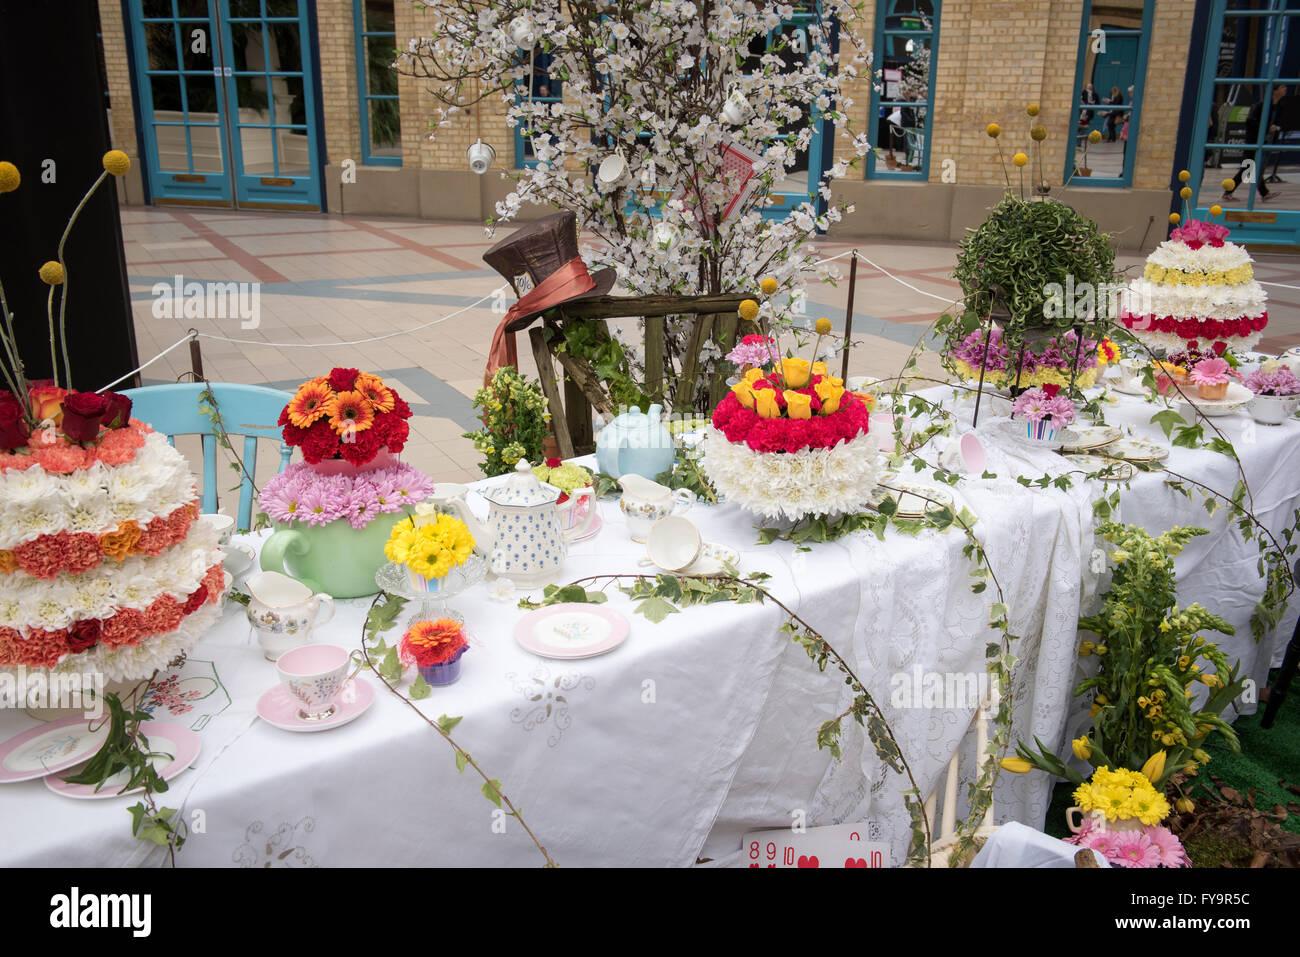 Cake International – The Sugarcraft, Cake Decorating and Baking Show in London - Stock Image